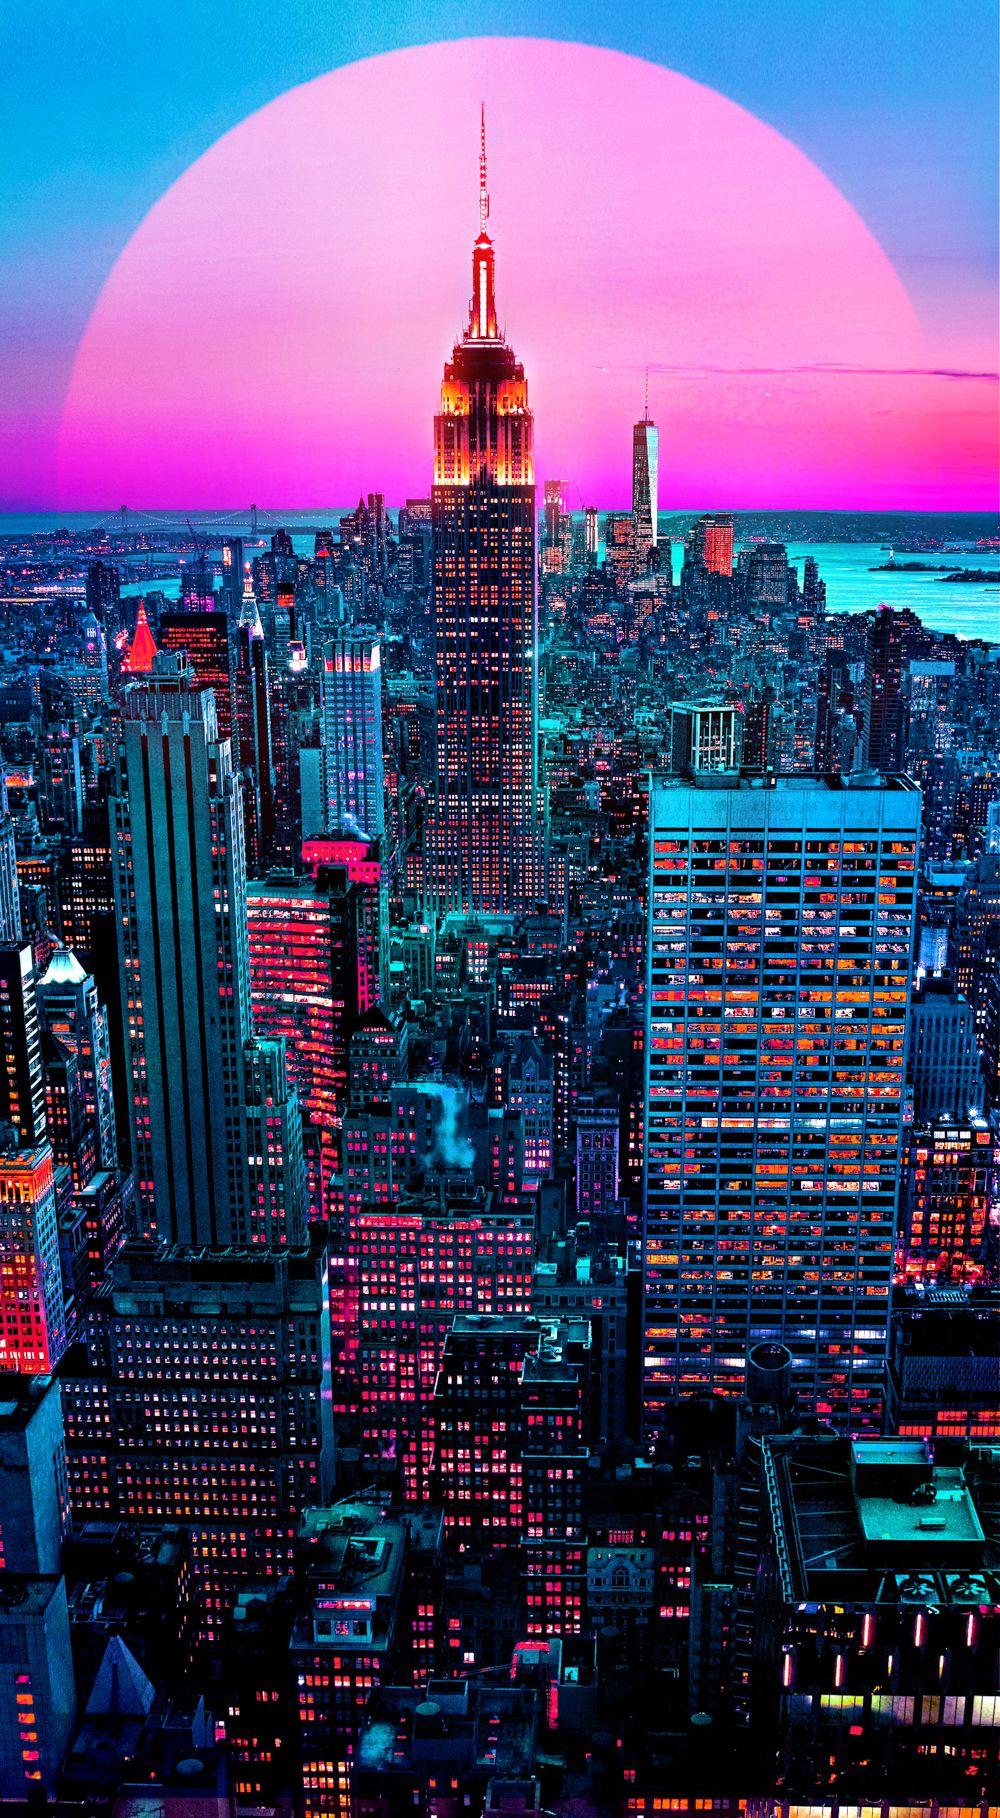 Neon City Wallpaper : wallpaper, Wallpaper,, Wallpaper, Tumblr, Lockscreen,, Android